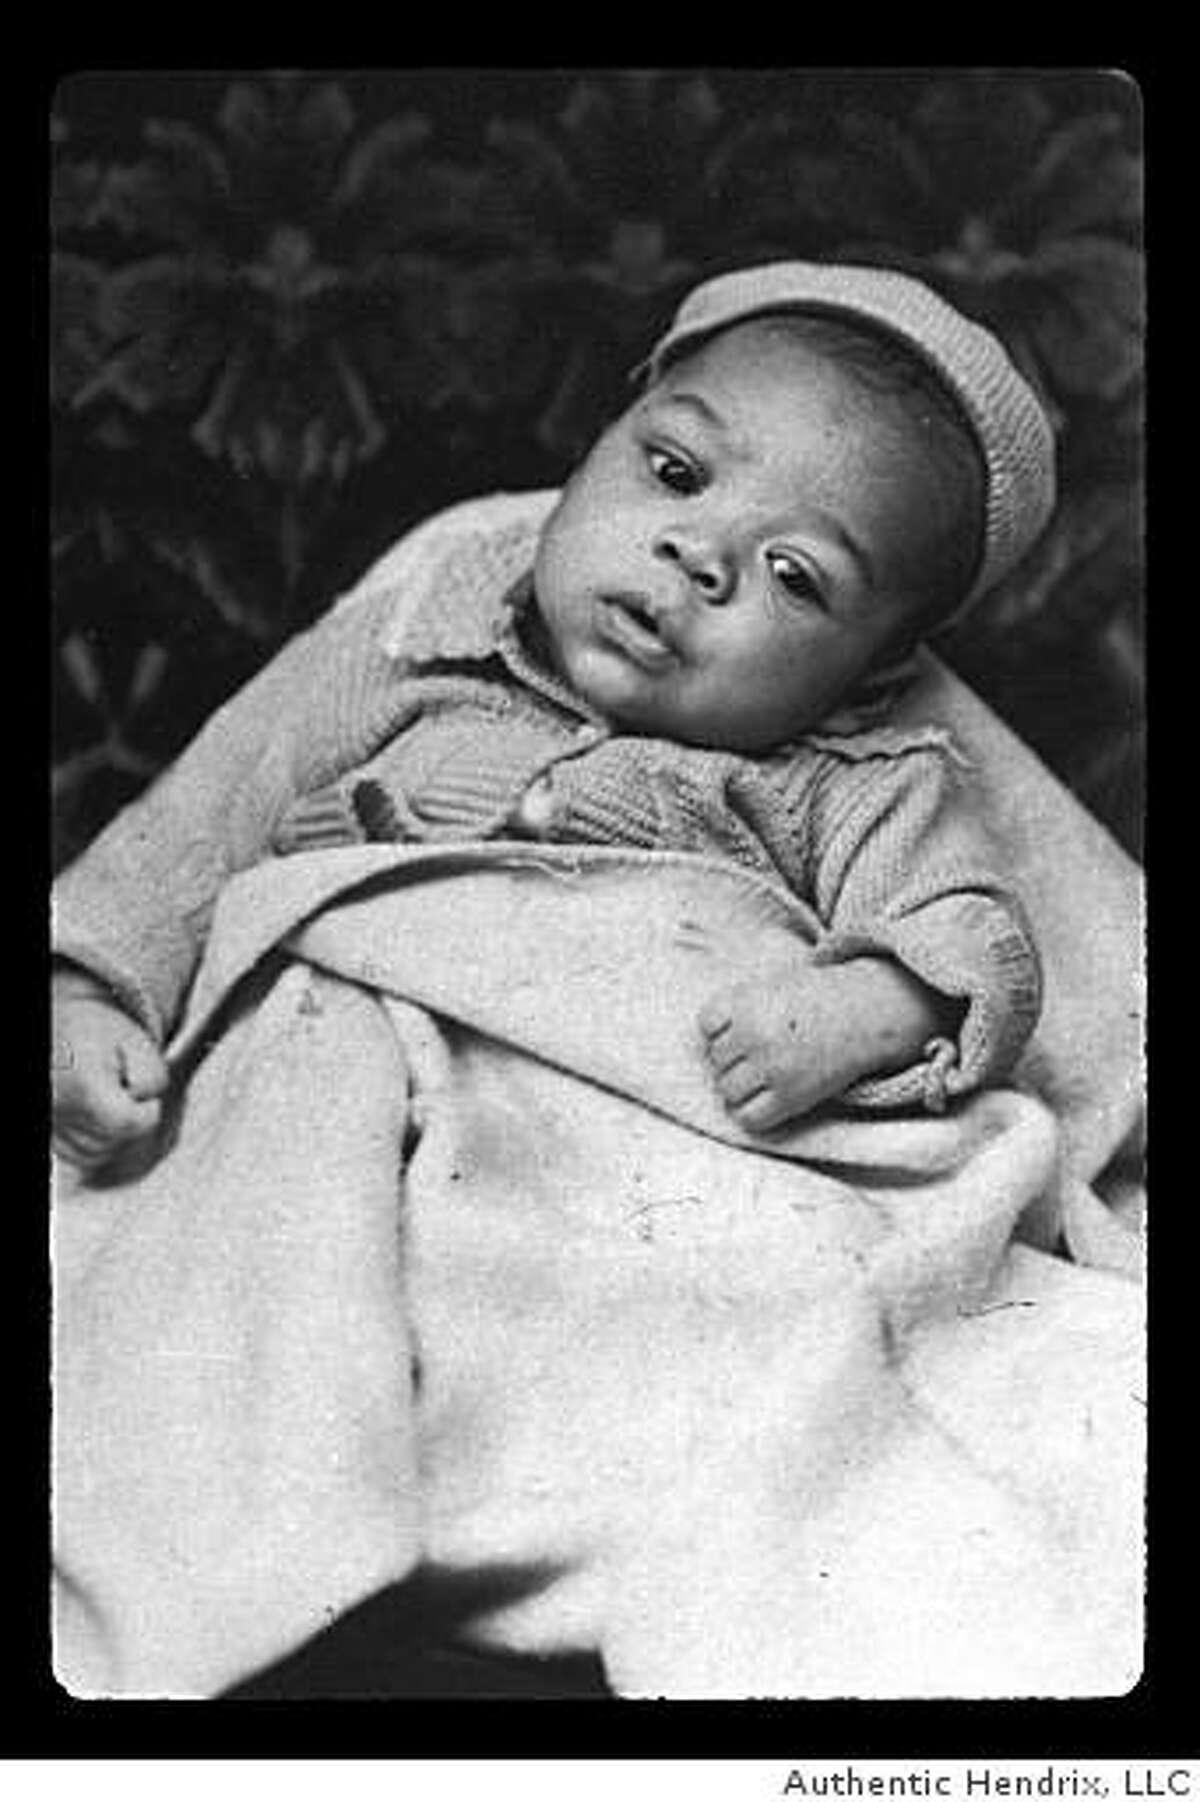 Jimi Hendrix taken on February 20, 1943